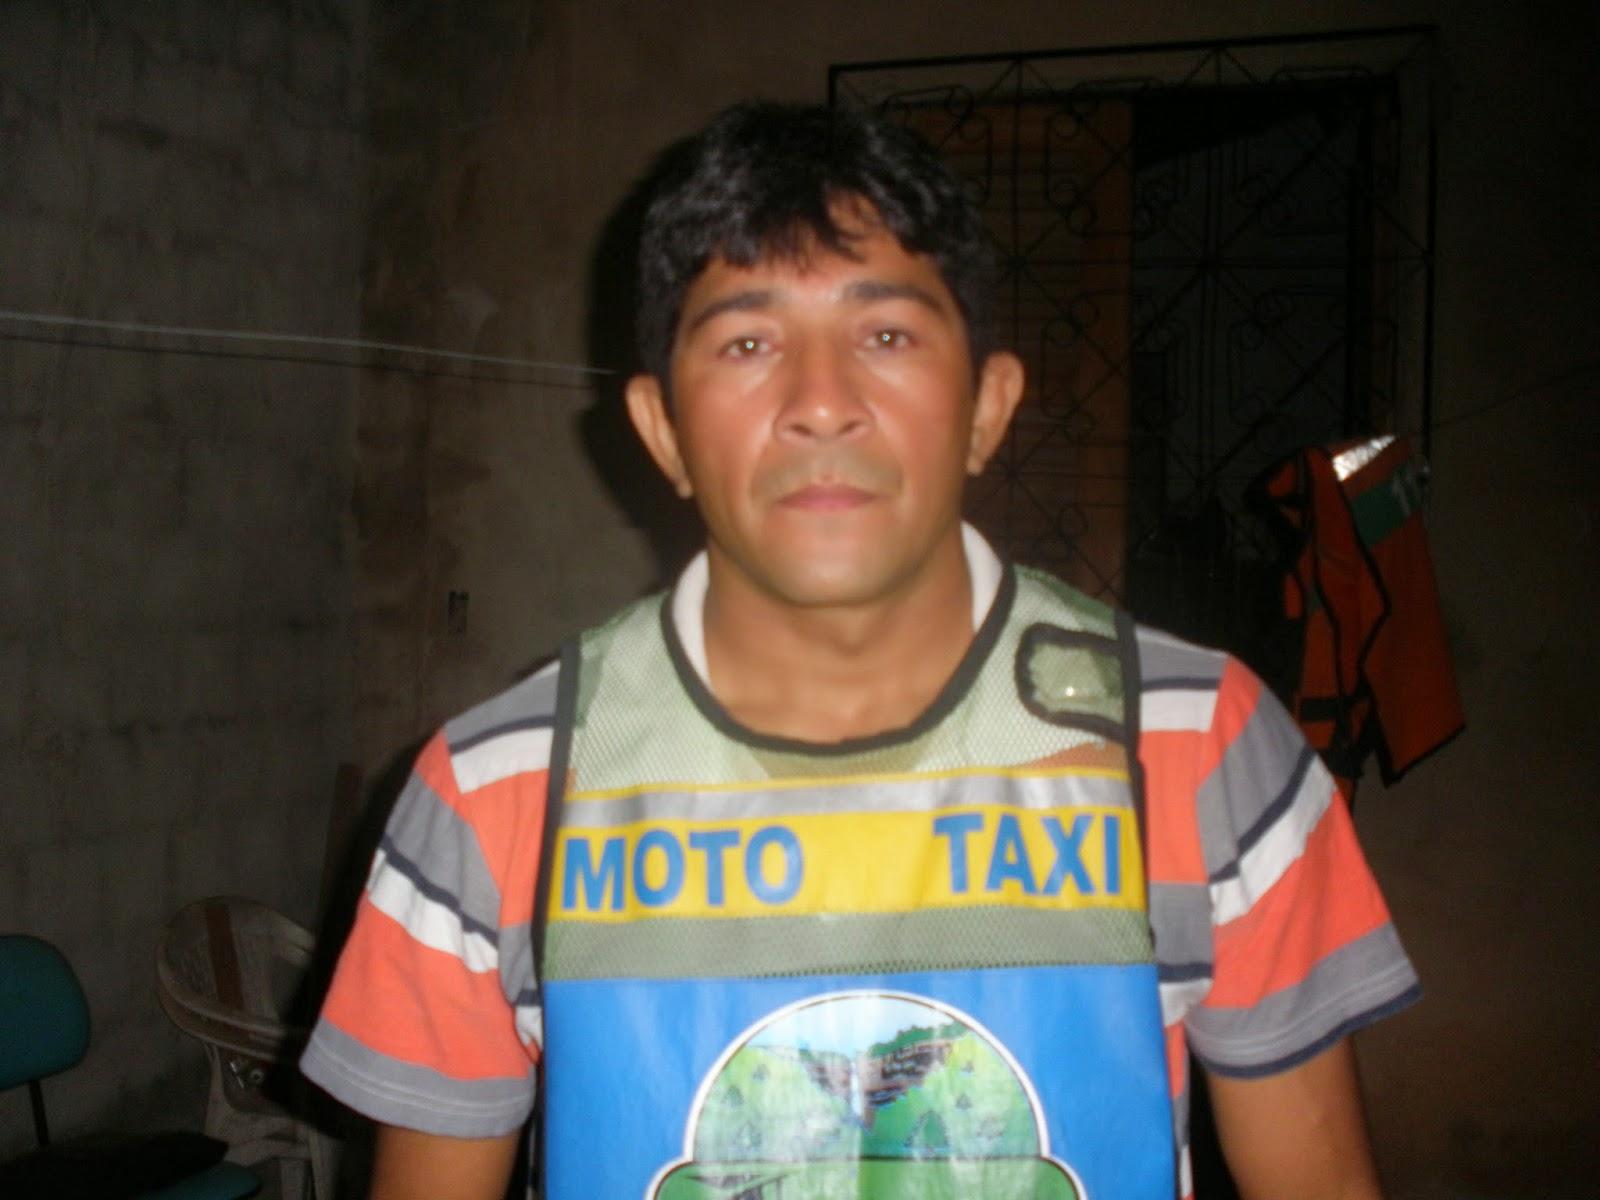 Entrevista: Ipu-CE: Mototaxista tem moto tomada de assalto, no embalo bandidos usam o veículo para roubar posto de combustíveis